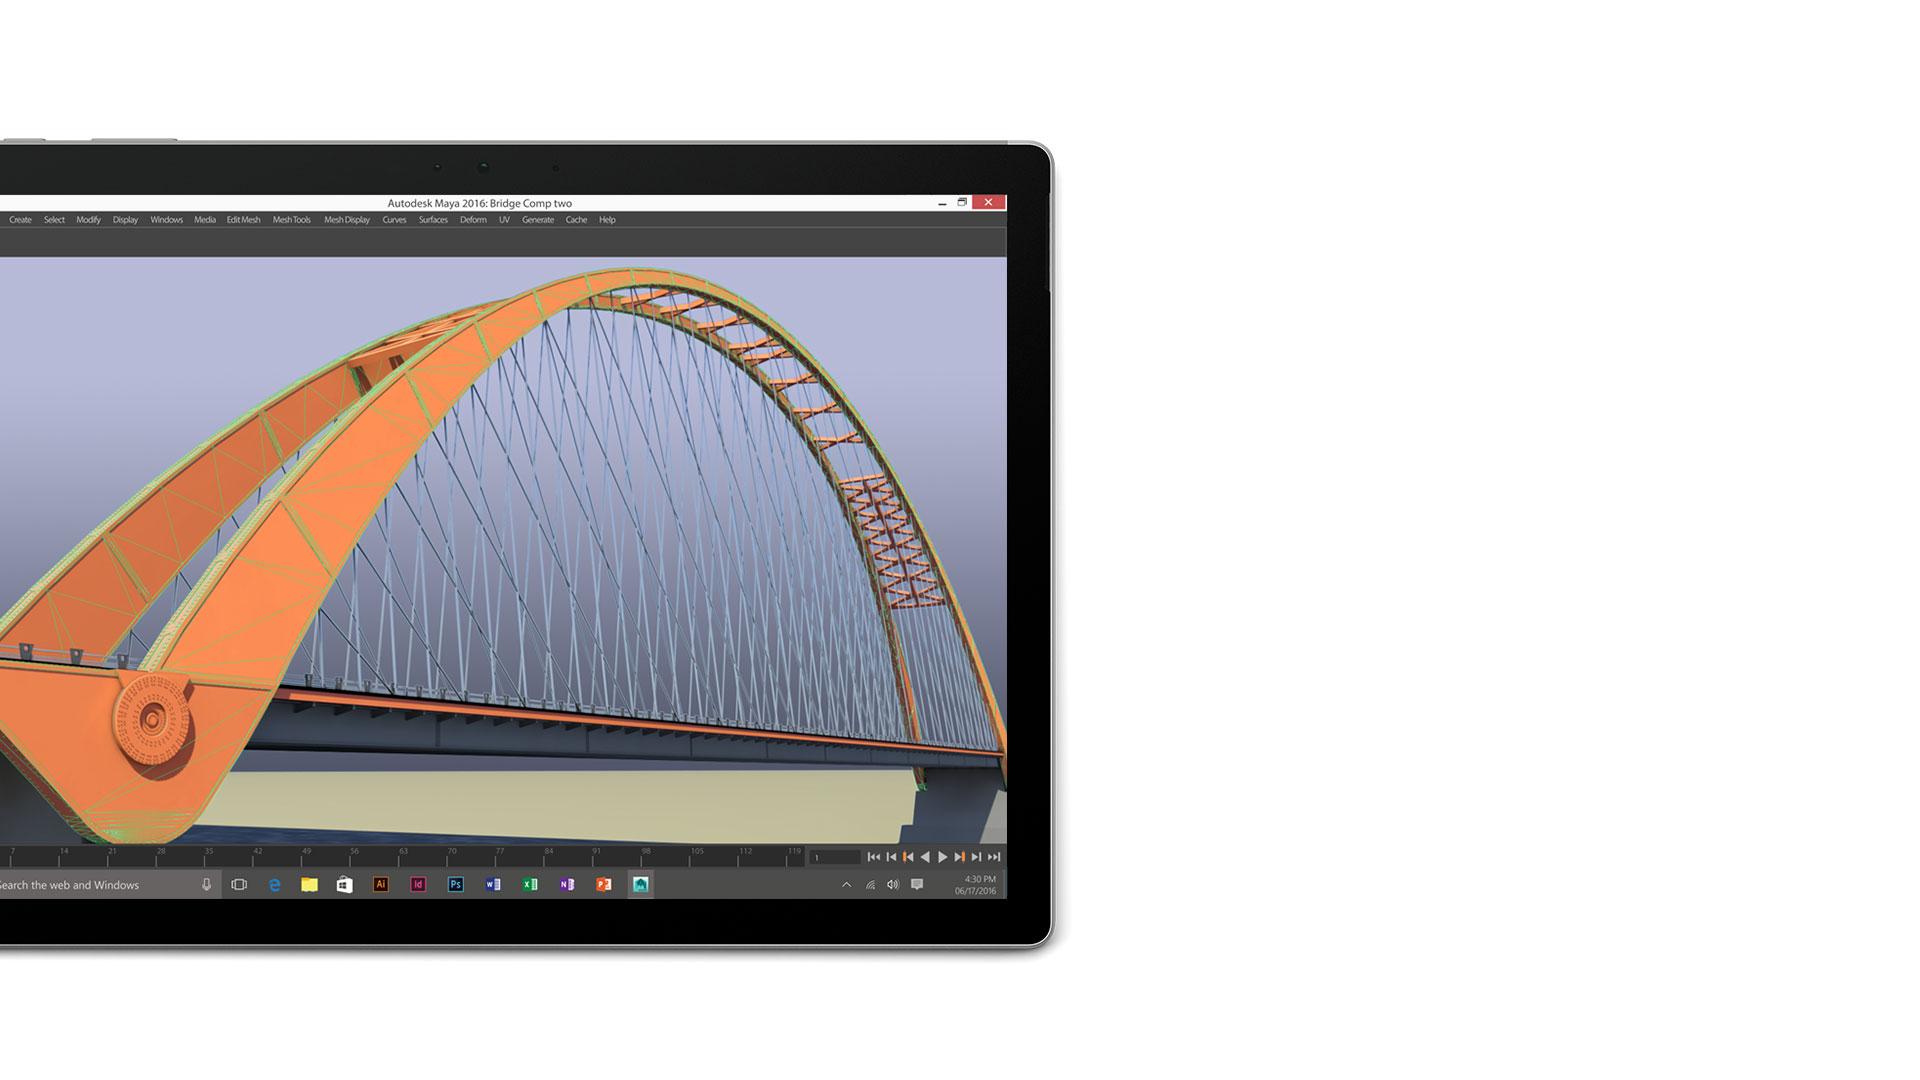 Autodesk Maya 2016 open on the Surface Book display